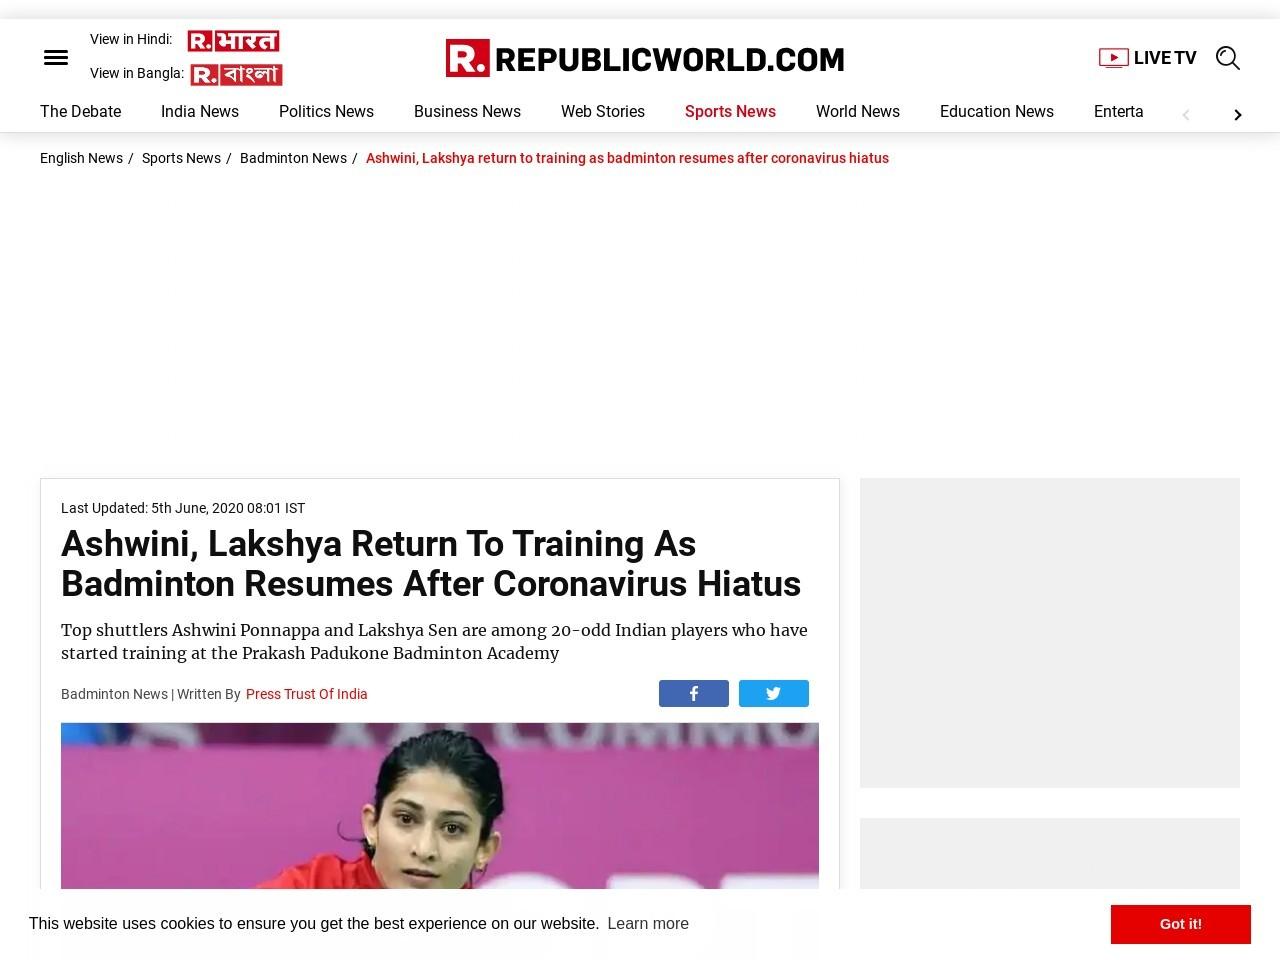 Ashwini, Lakshya return to training as badminton resumes after coronavirus hiatus – Republic World